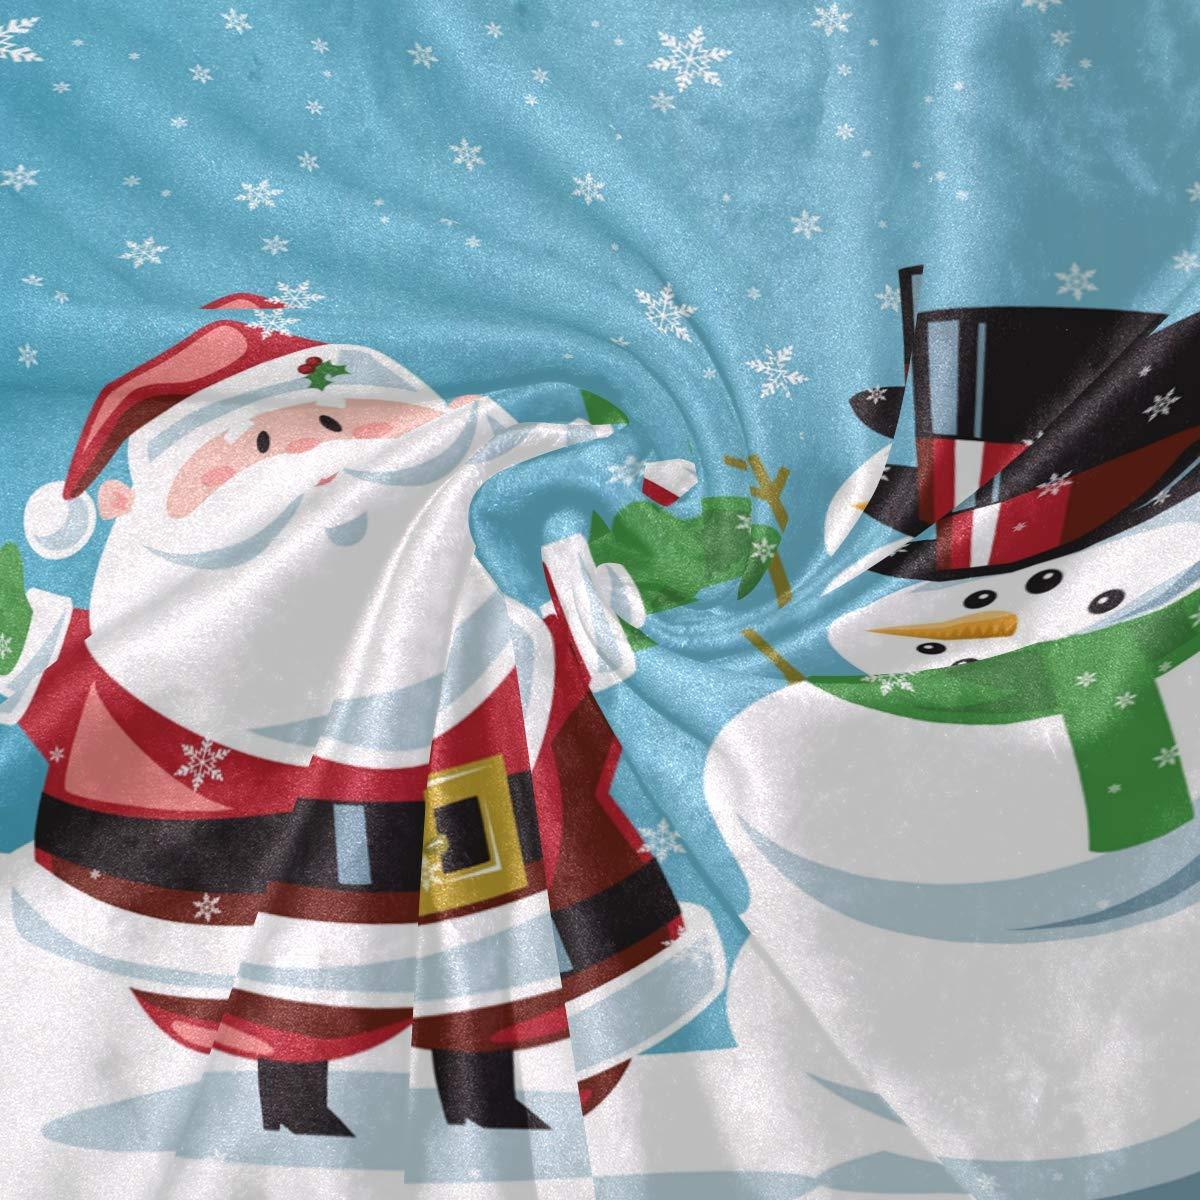 Amazon.com: Wamika Merry Christmas Throw Blanket Home Decor, Super ...